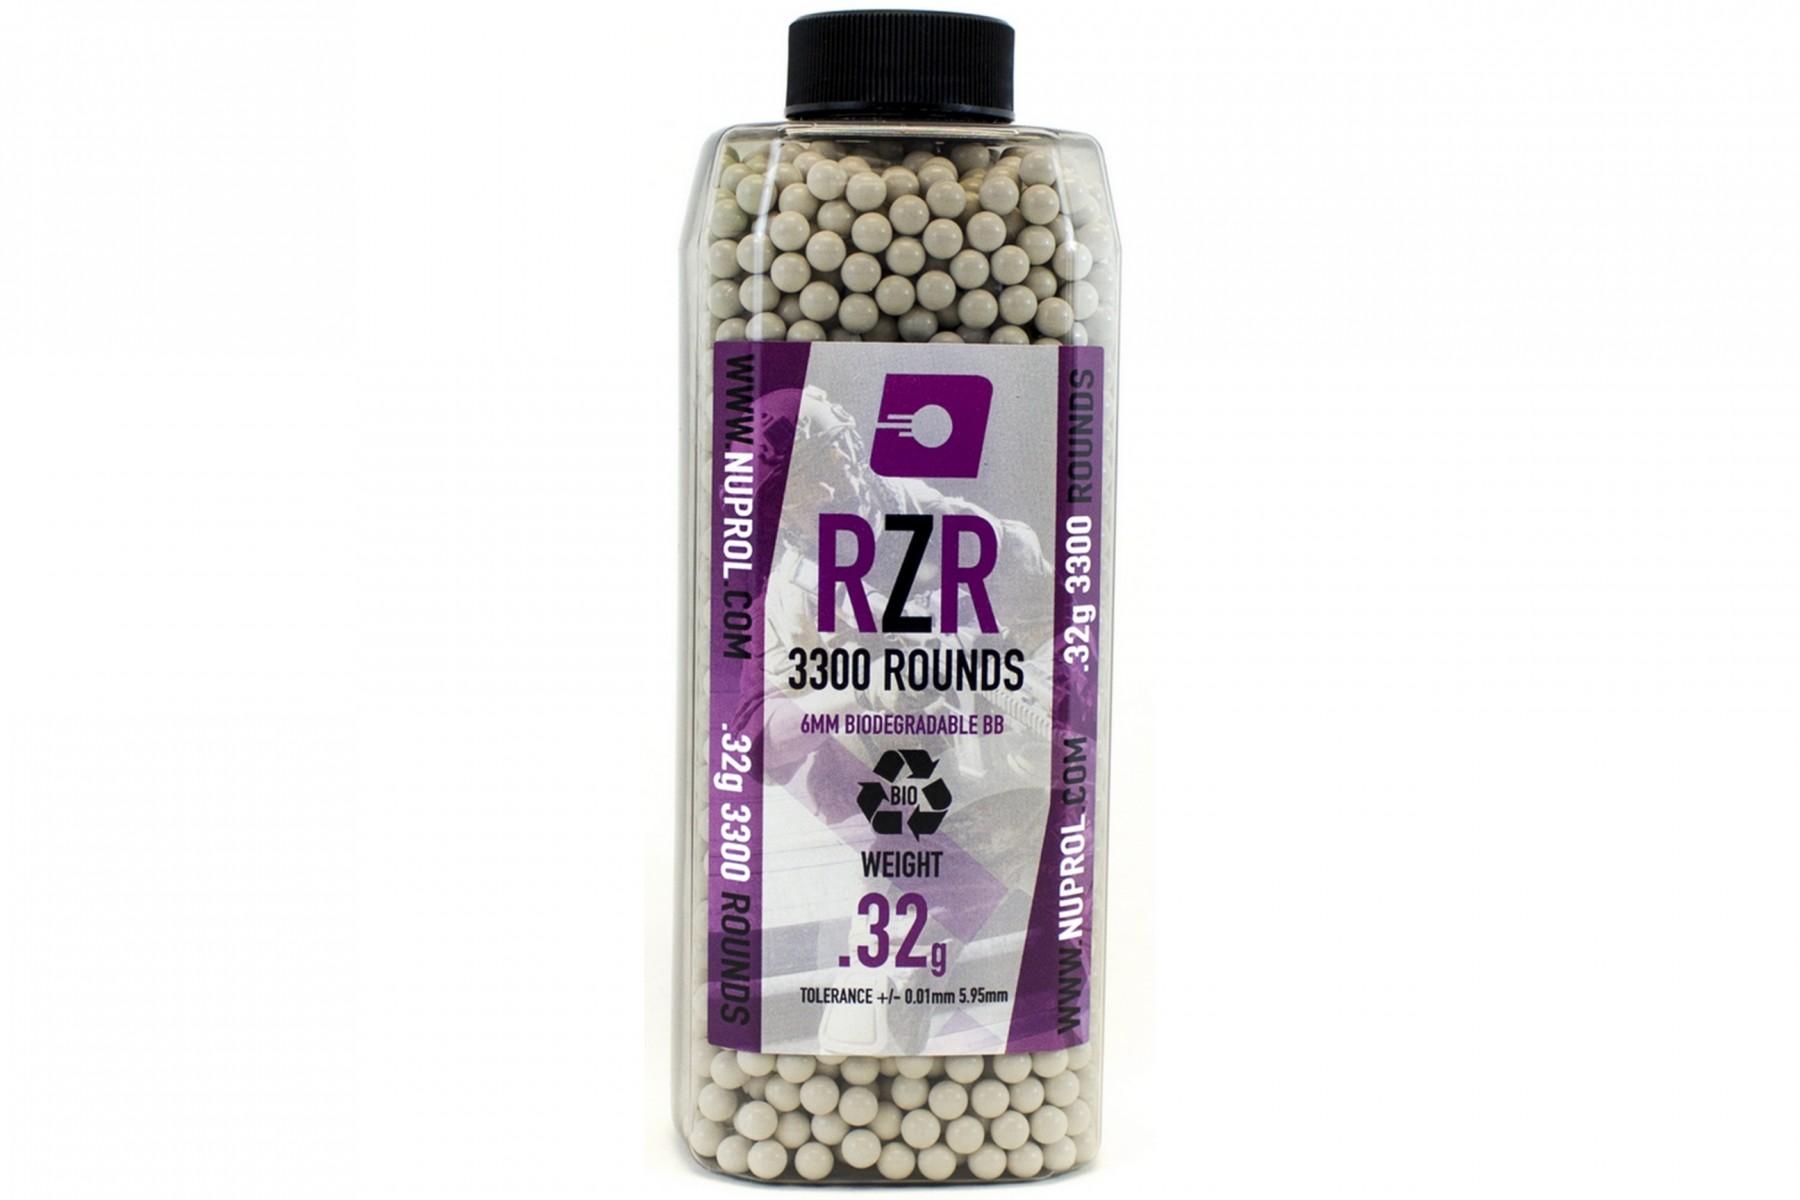 NUPROL RZR 3300rnd 0.32g Bio BBs product image